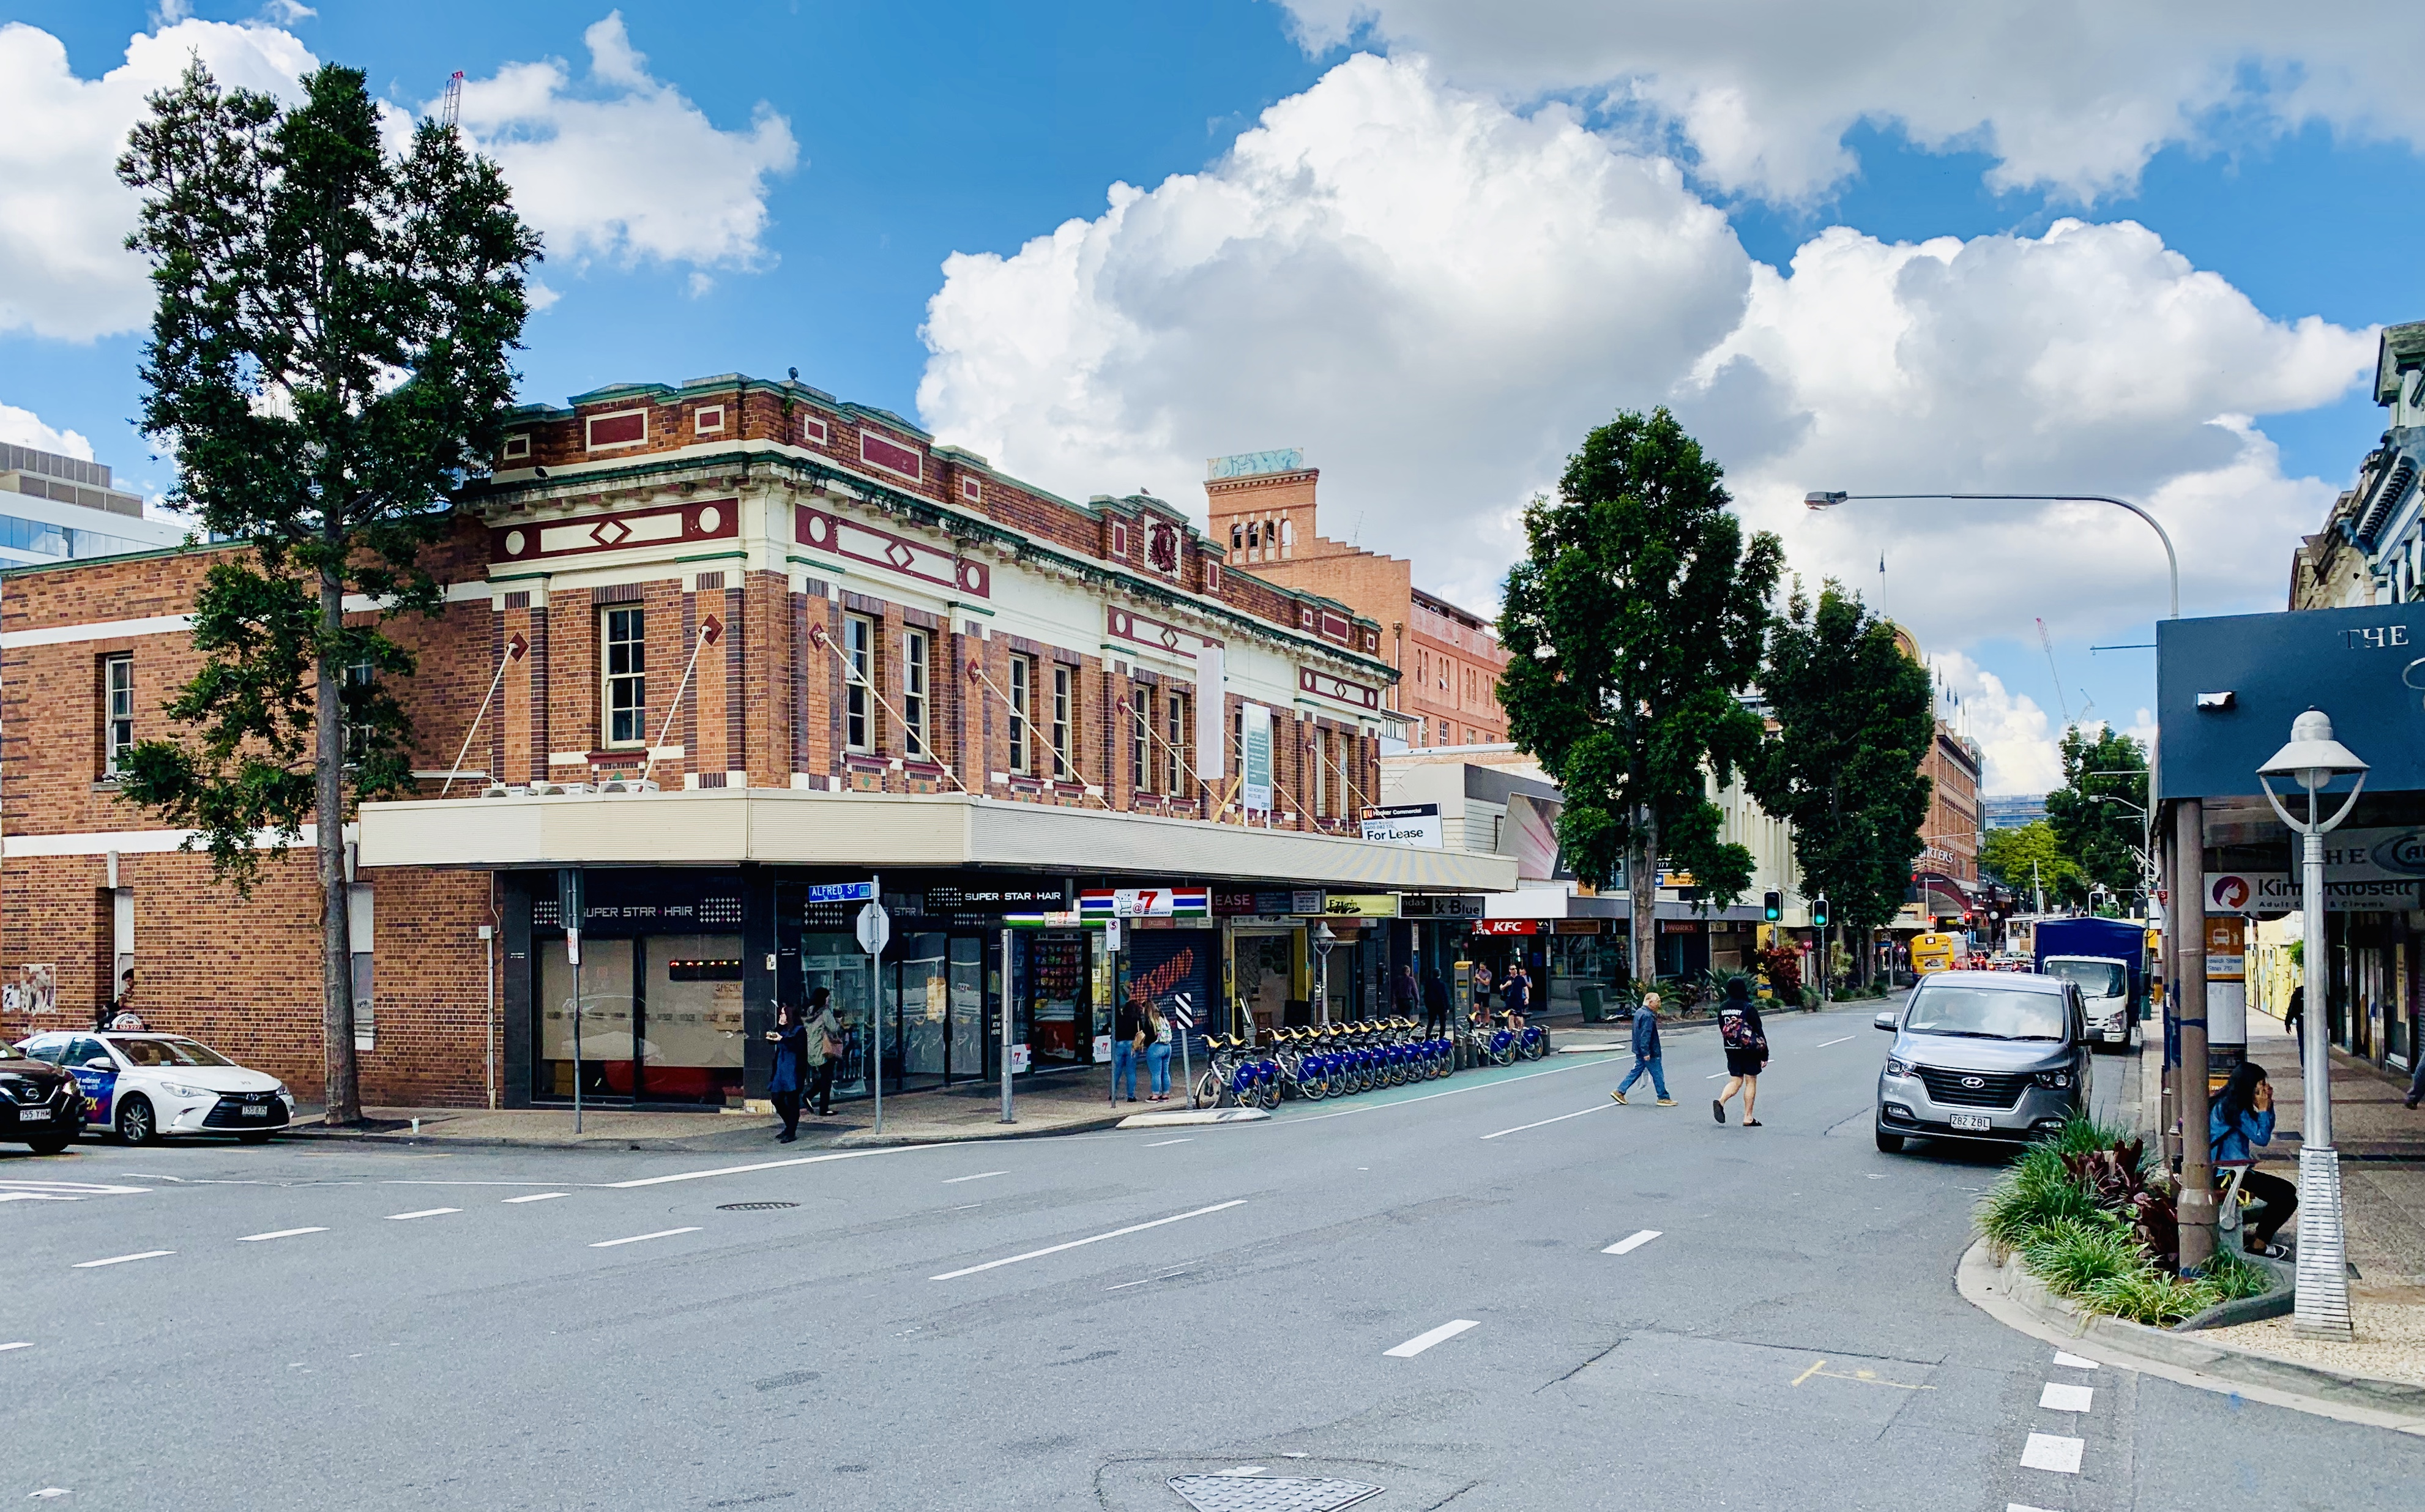 Brunswick Street, Fortitude Valley, Brisbane, Queensland 01.jpg